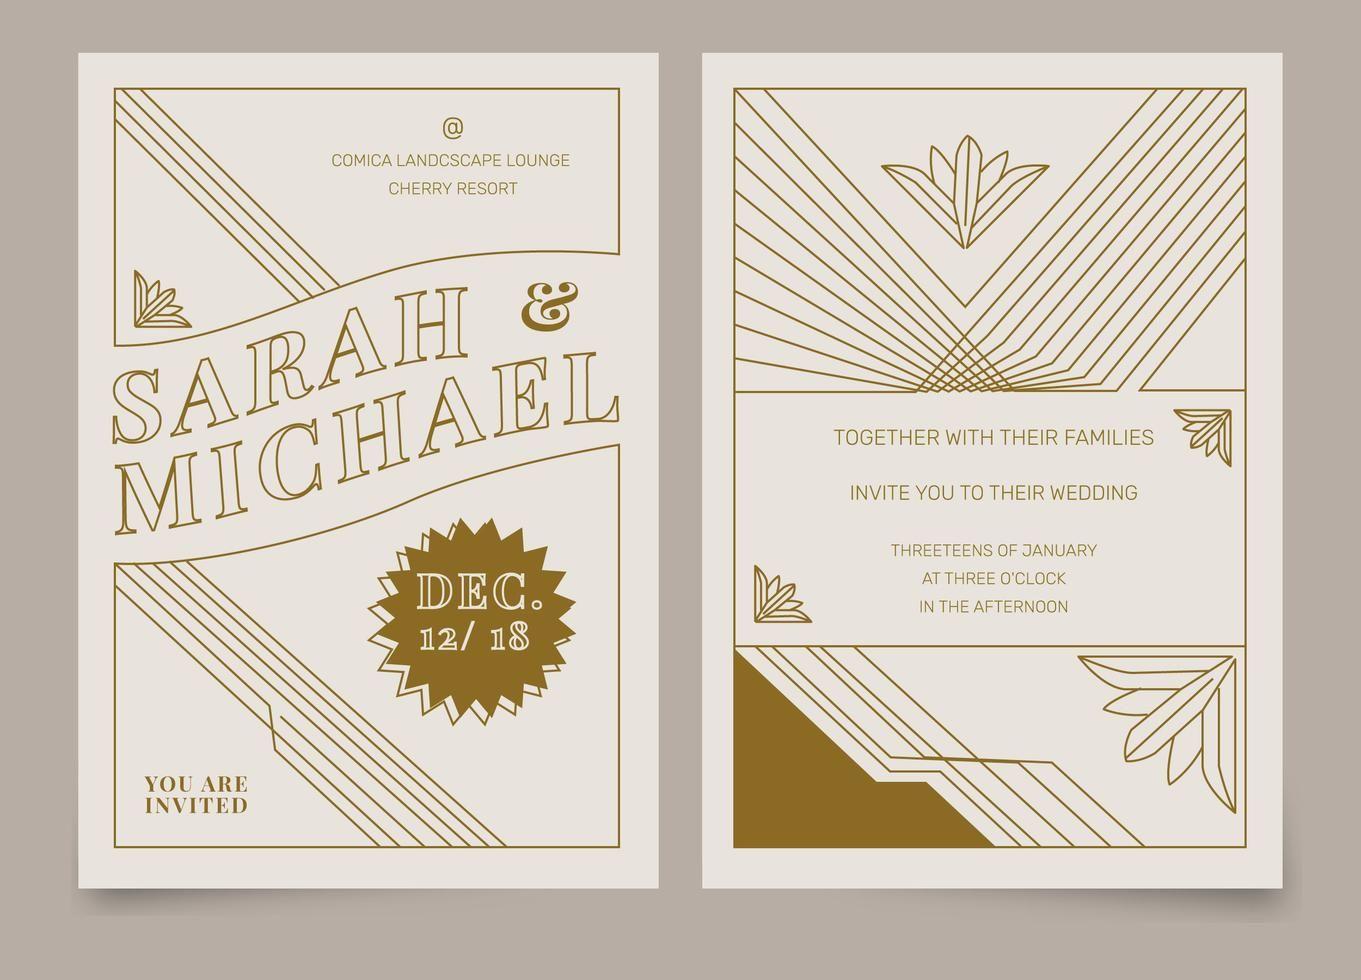 Brown Vintage Art Deco Wedding Invitation Vector Template | Deco invitations,  Art deco wedding invitations, Deco wedding invitations